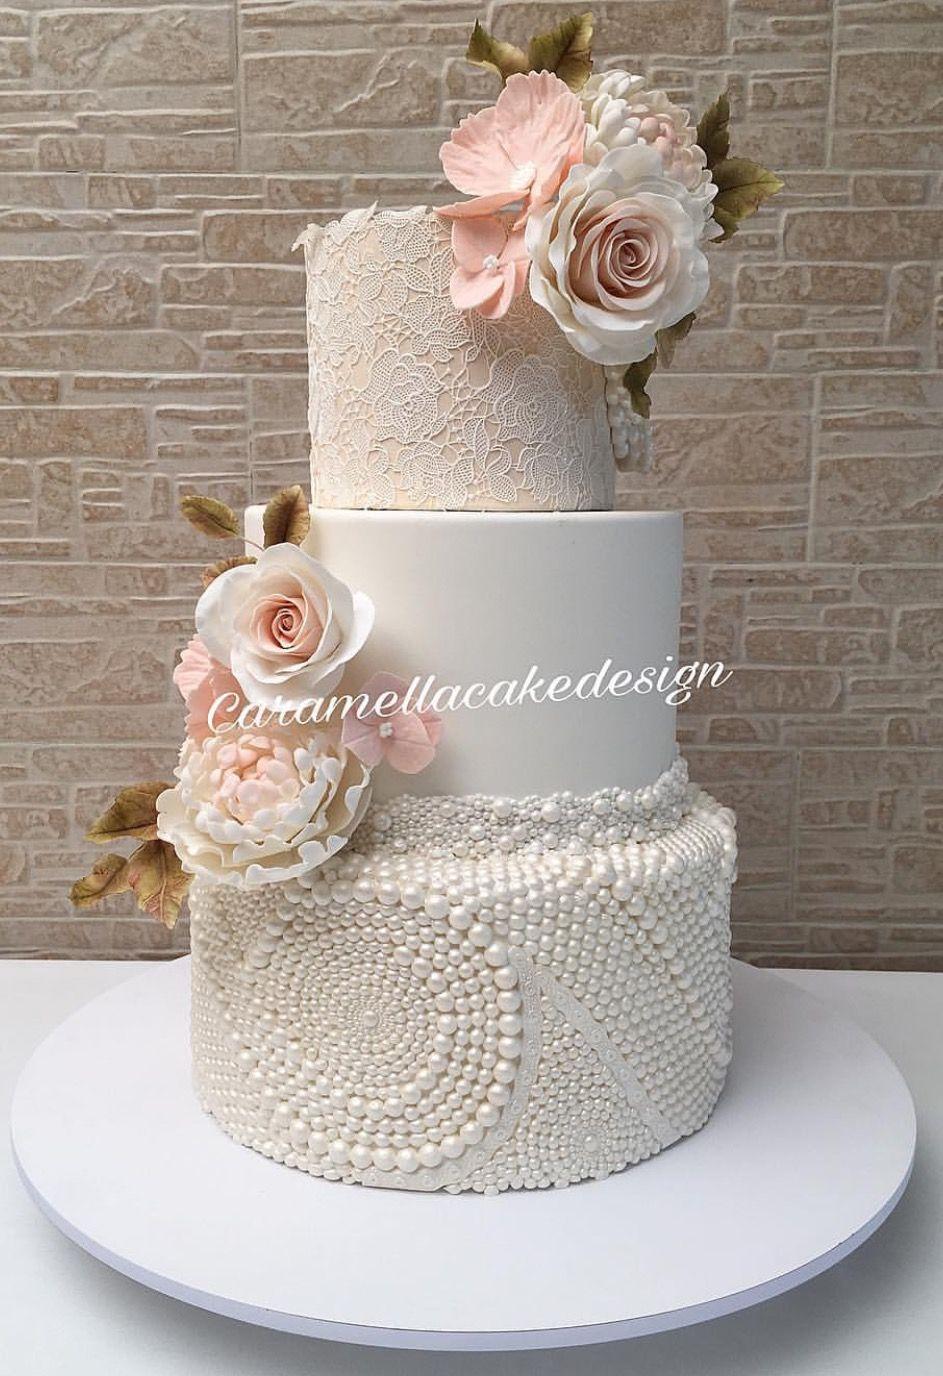 Pin by cheri cavanaugh on cakes pinterest cup cakes wedding